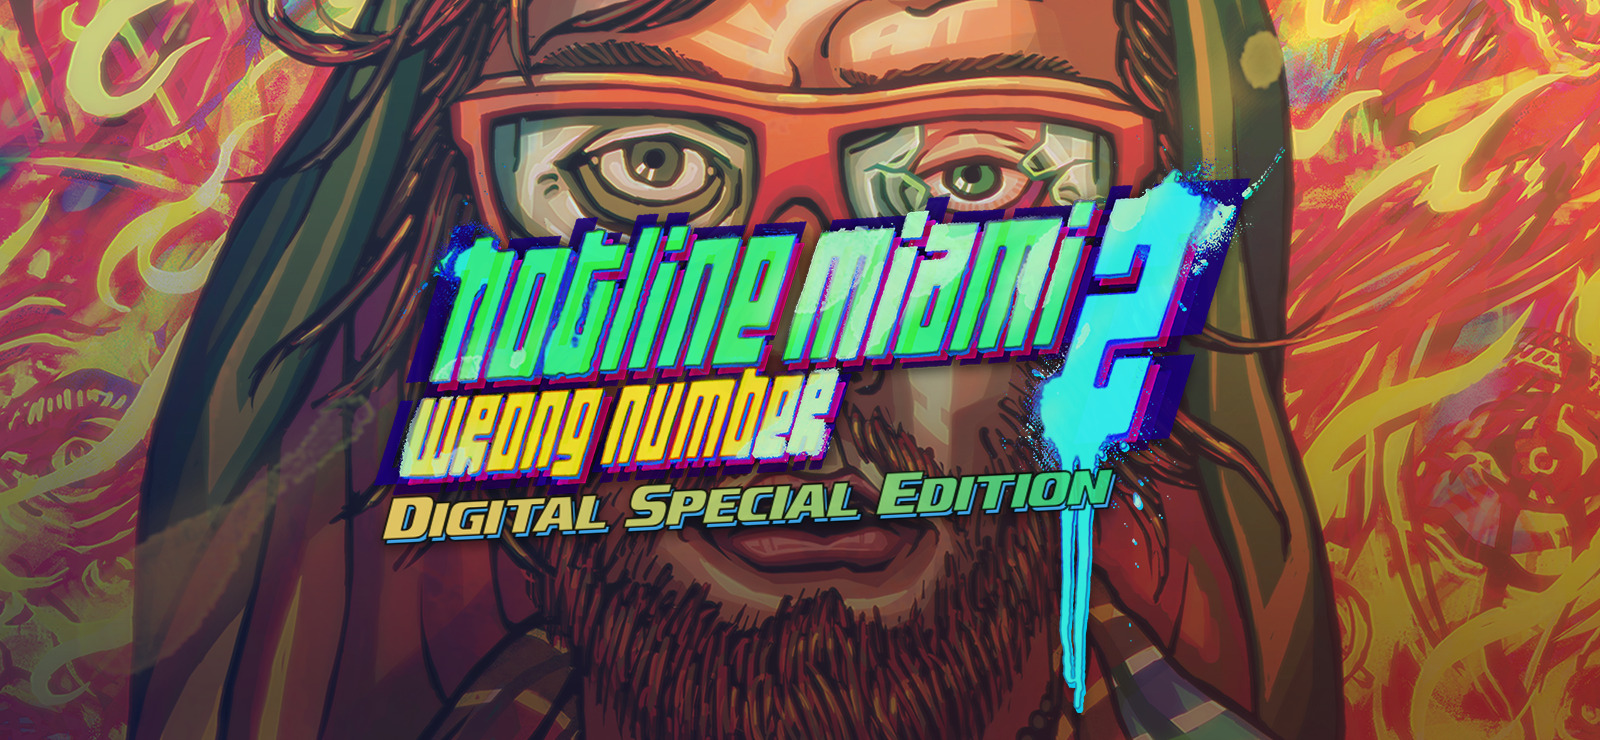 hotline miami 2 wrong number digital special edition on gog com